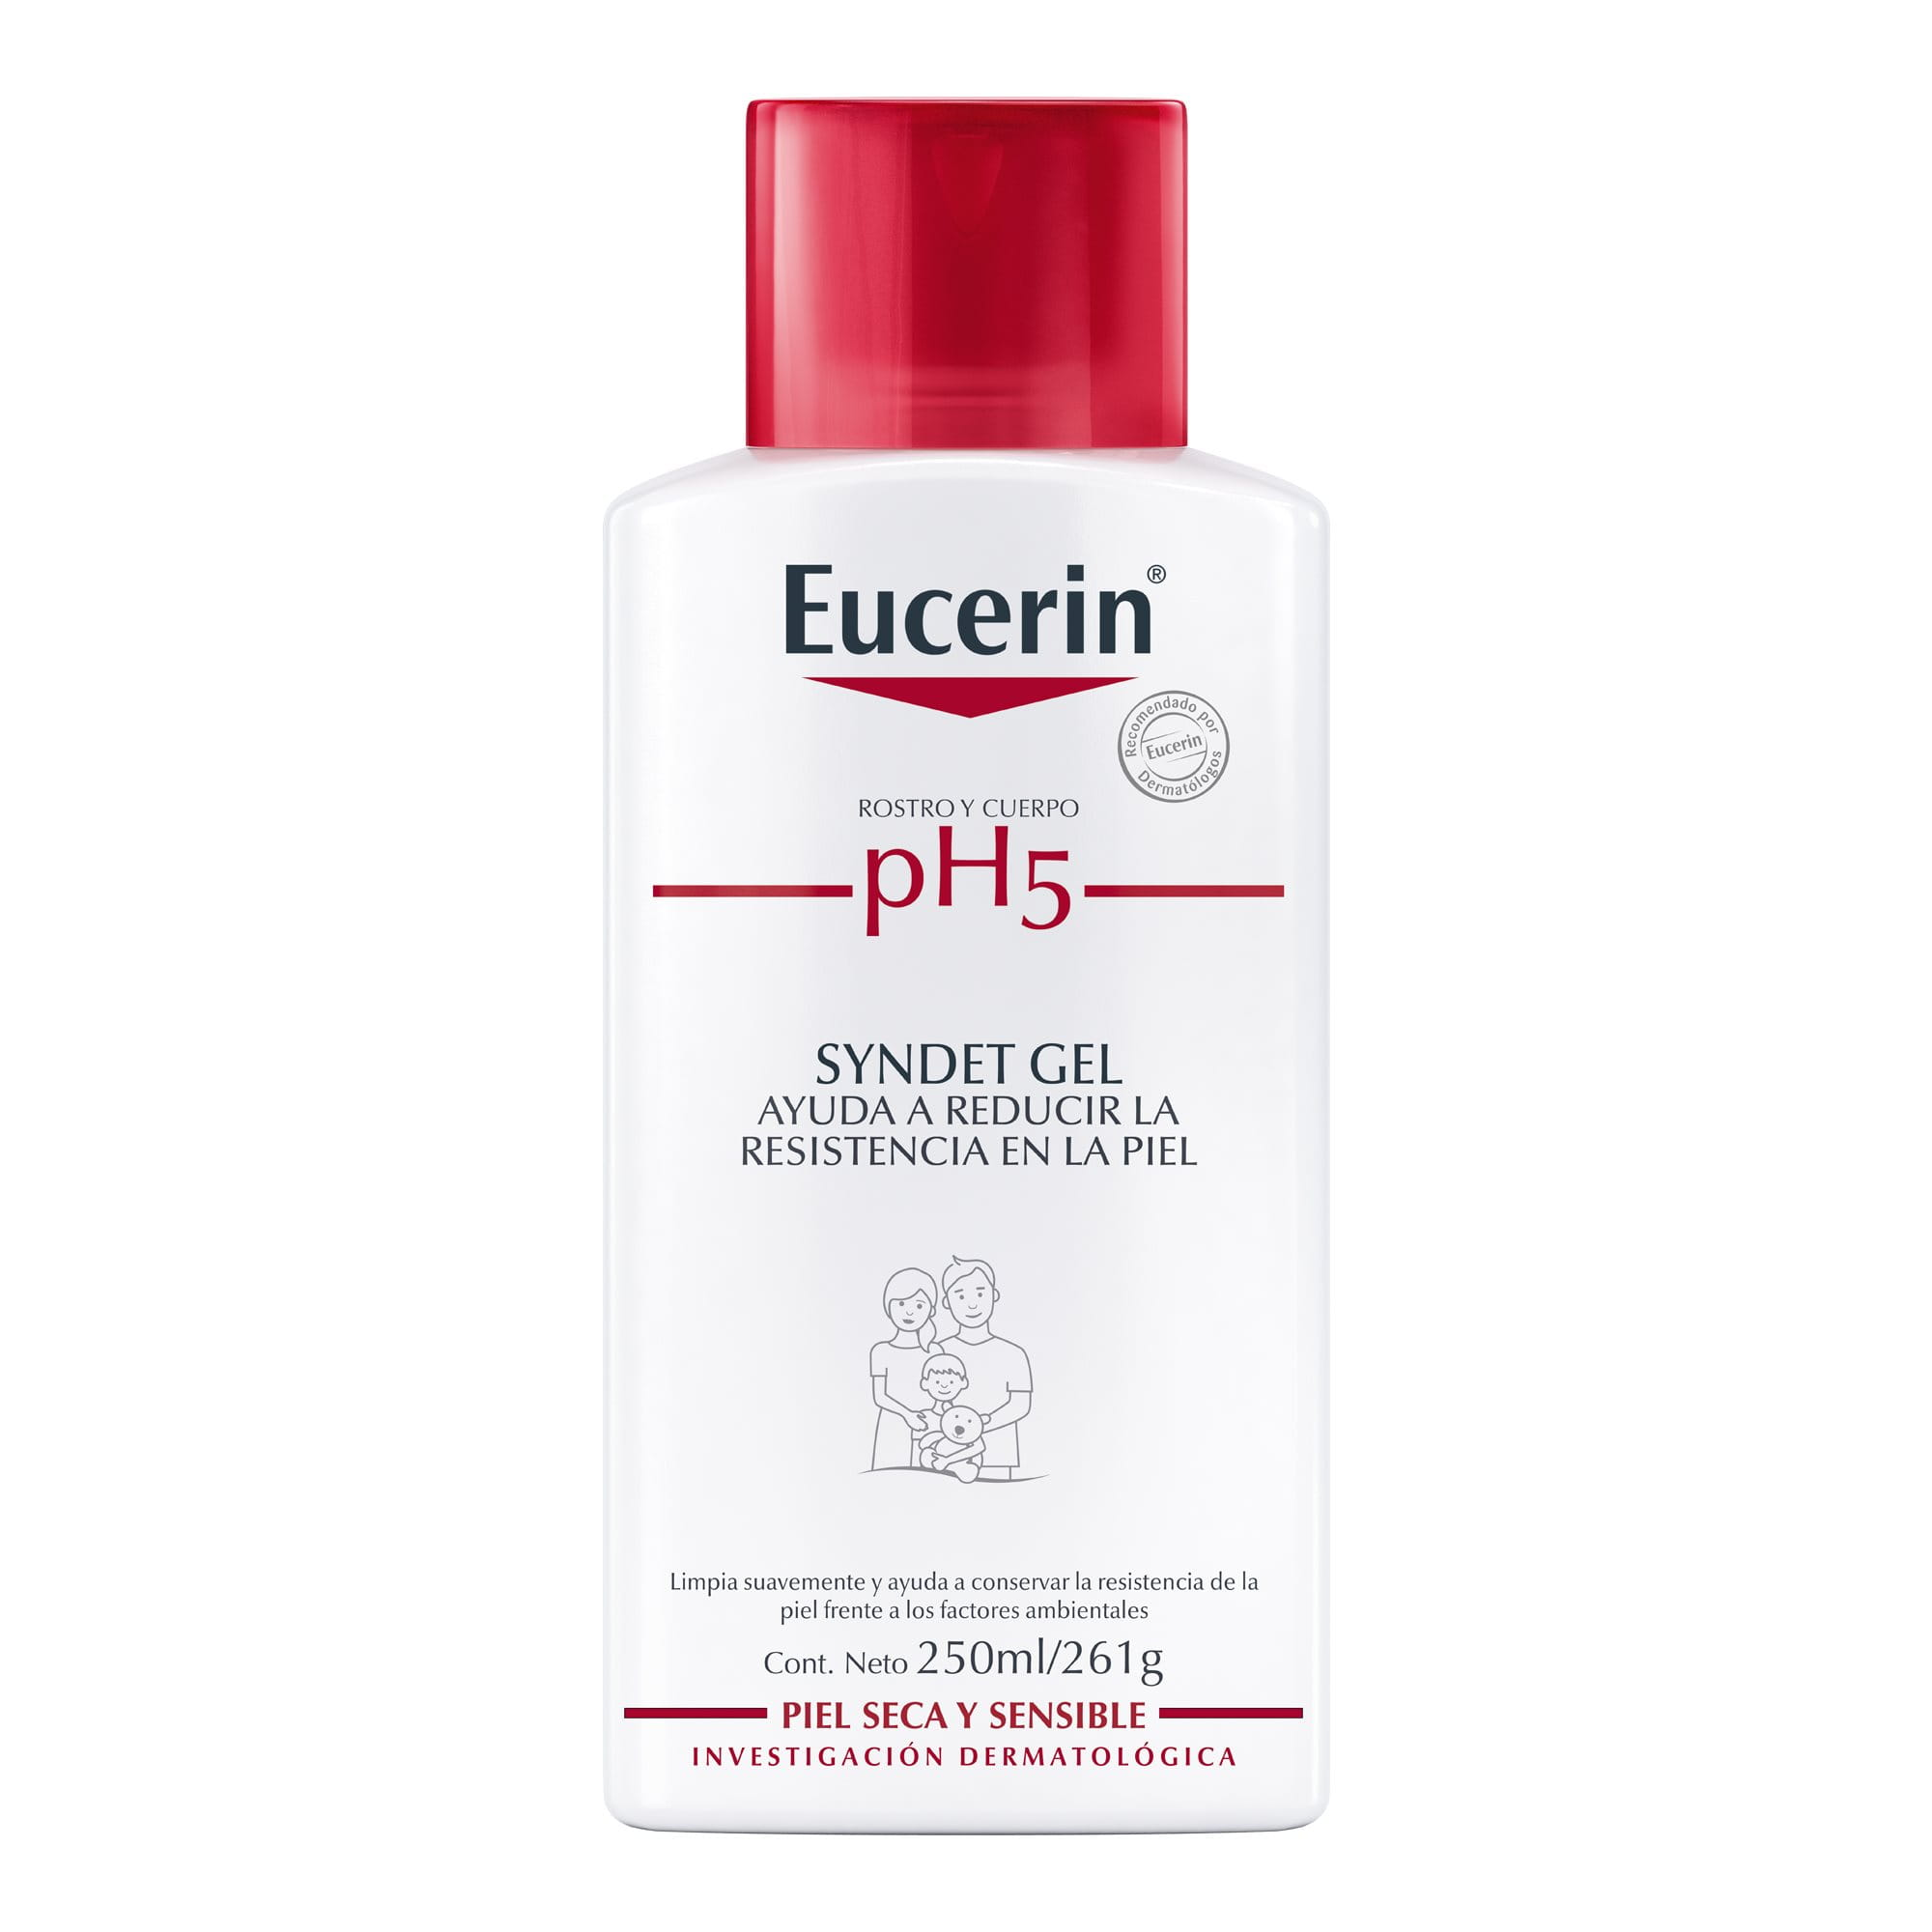 63088_Eucerin-PH5-Syndet-gel-250ml_packshot